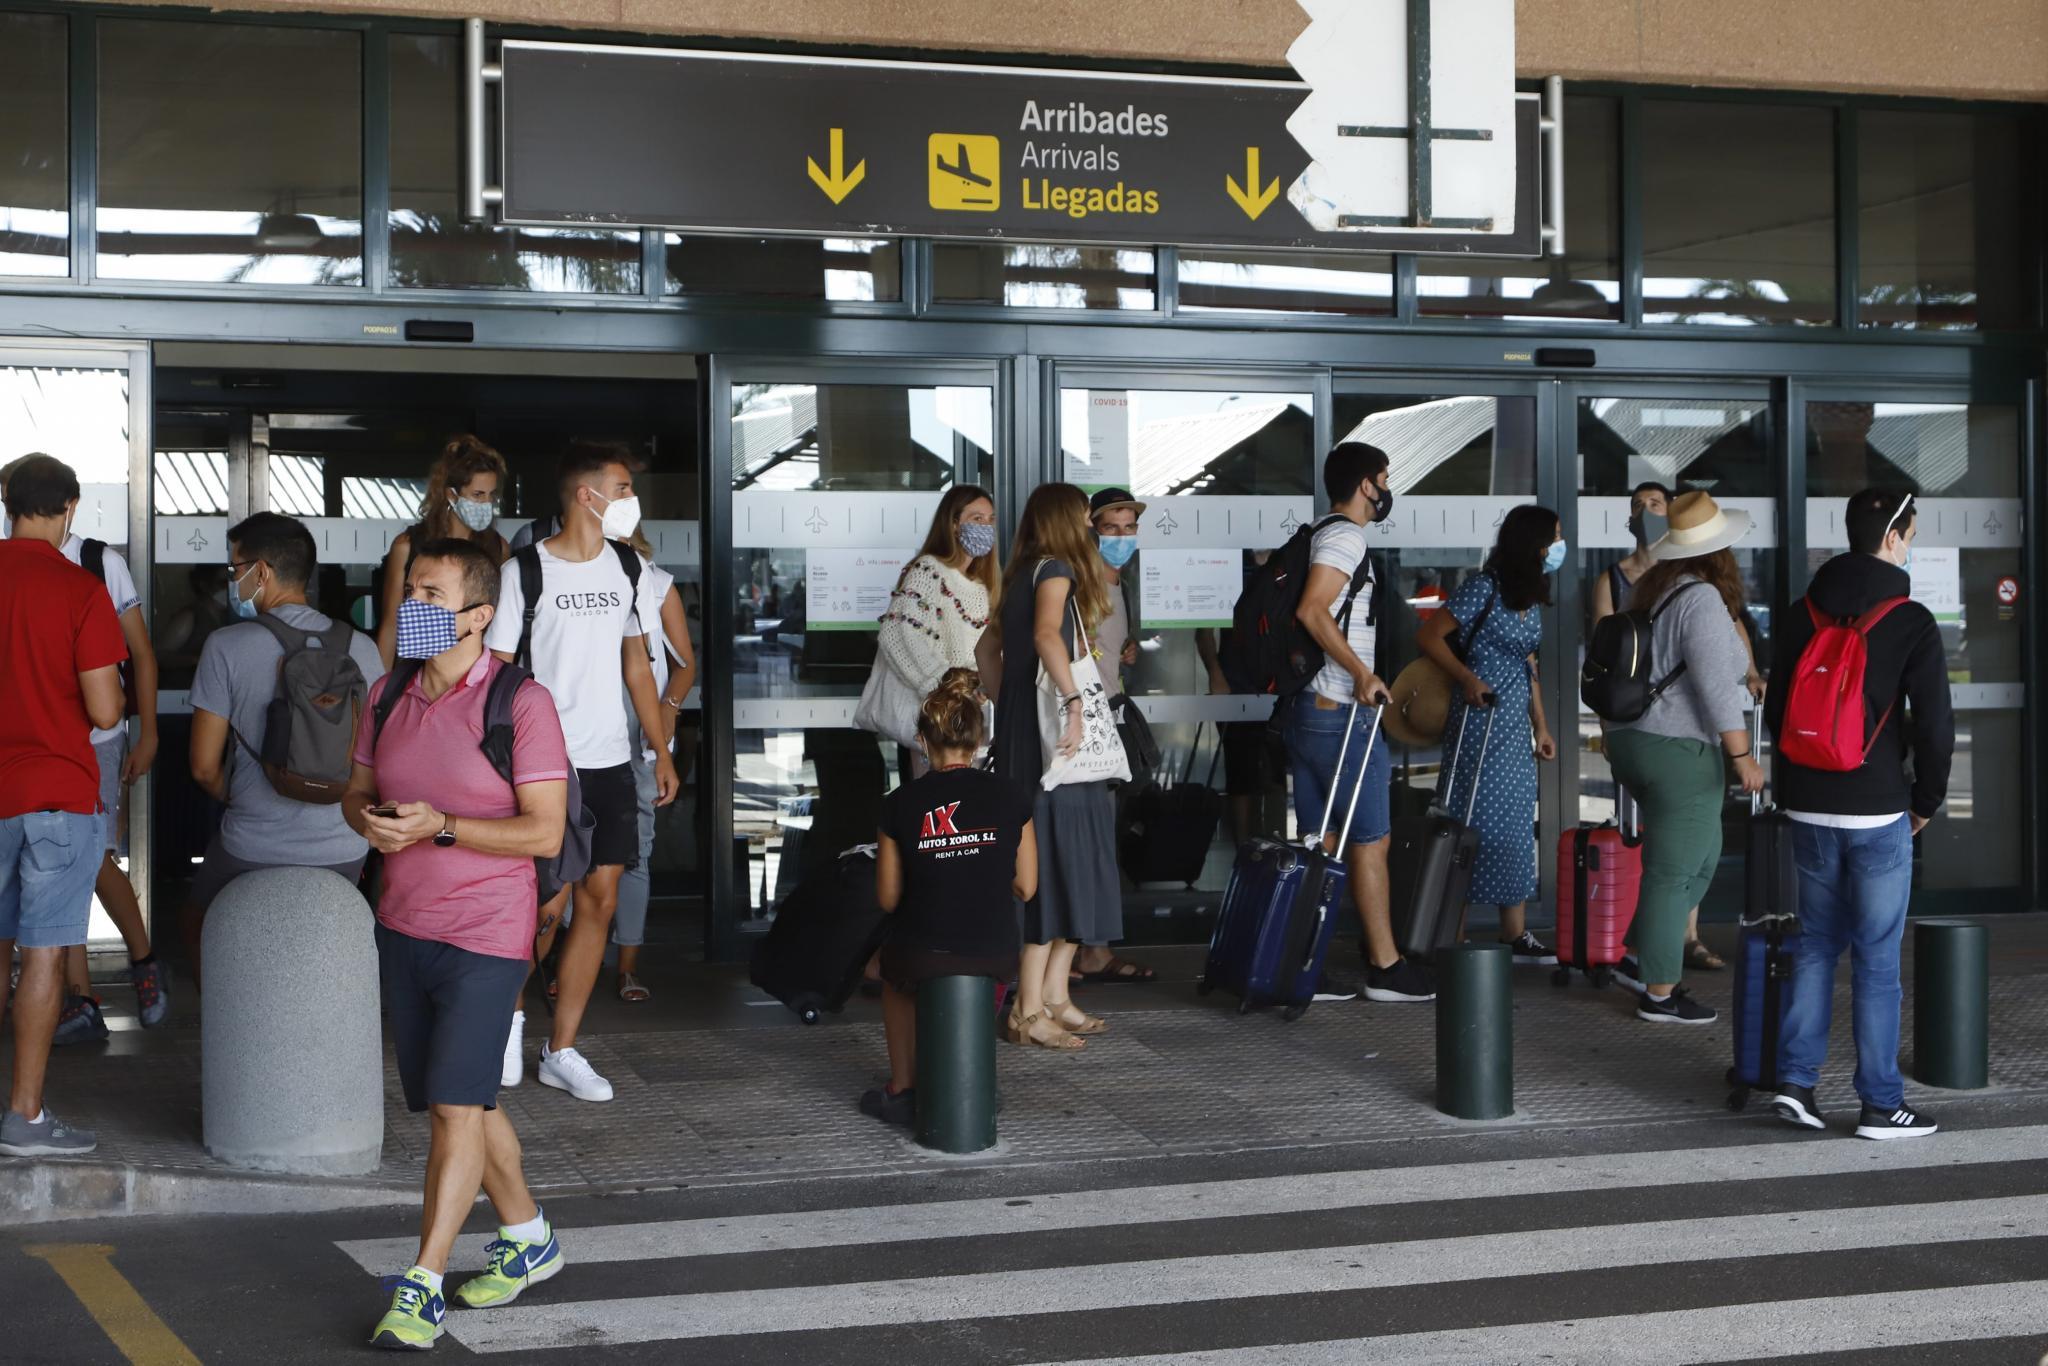 Menorca Mao / Gemma Andreu / Terminal llegadas / pasajeros turistas